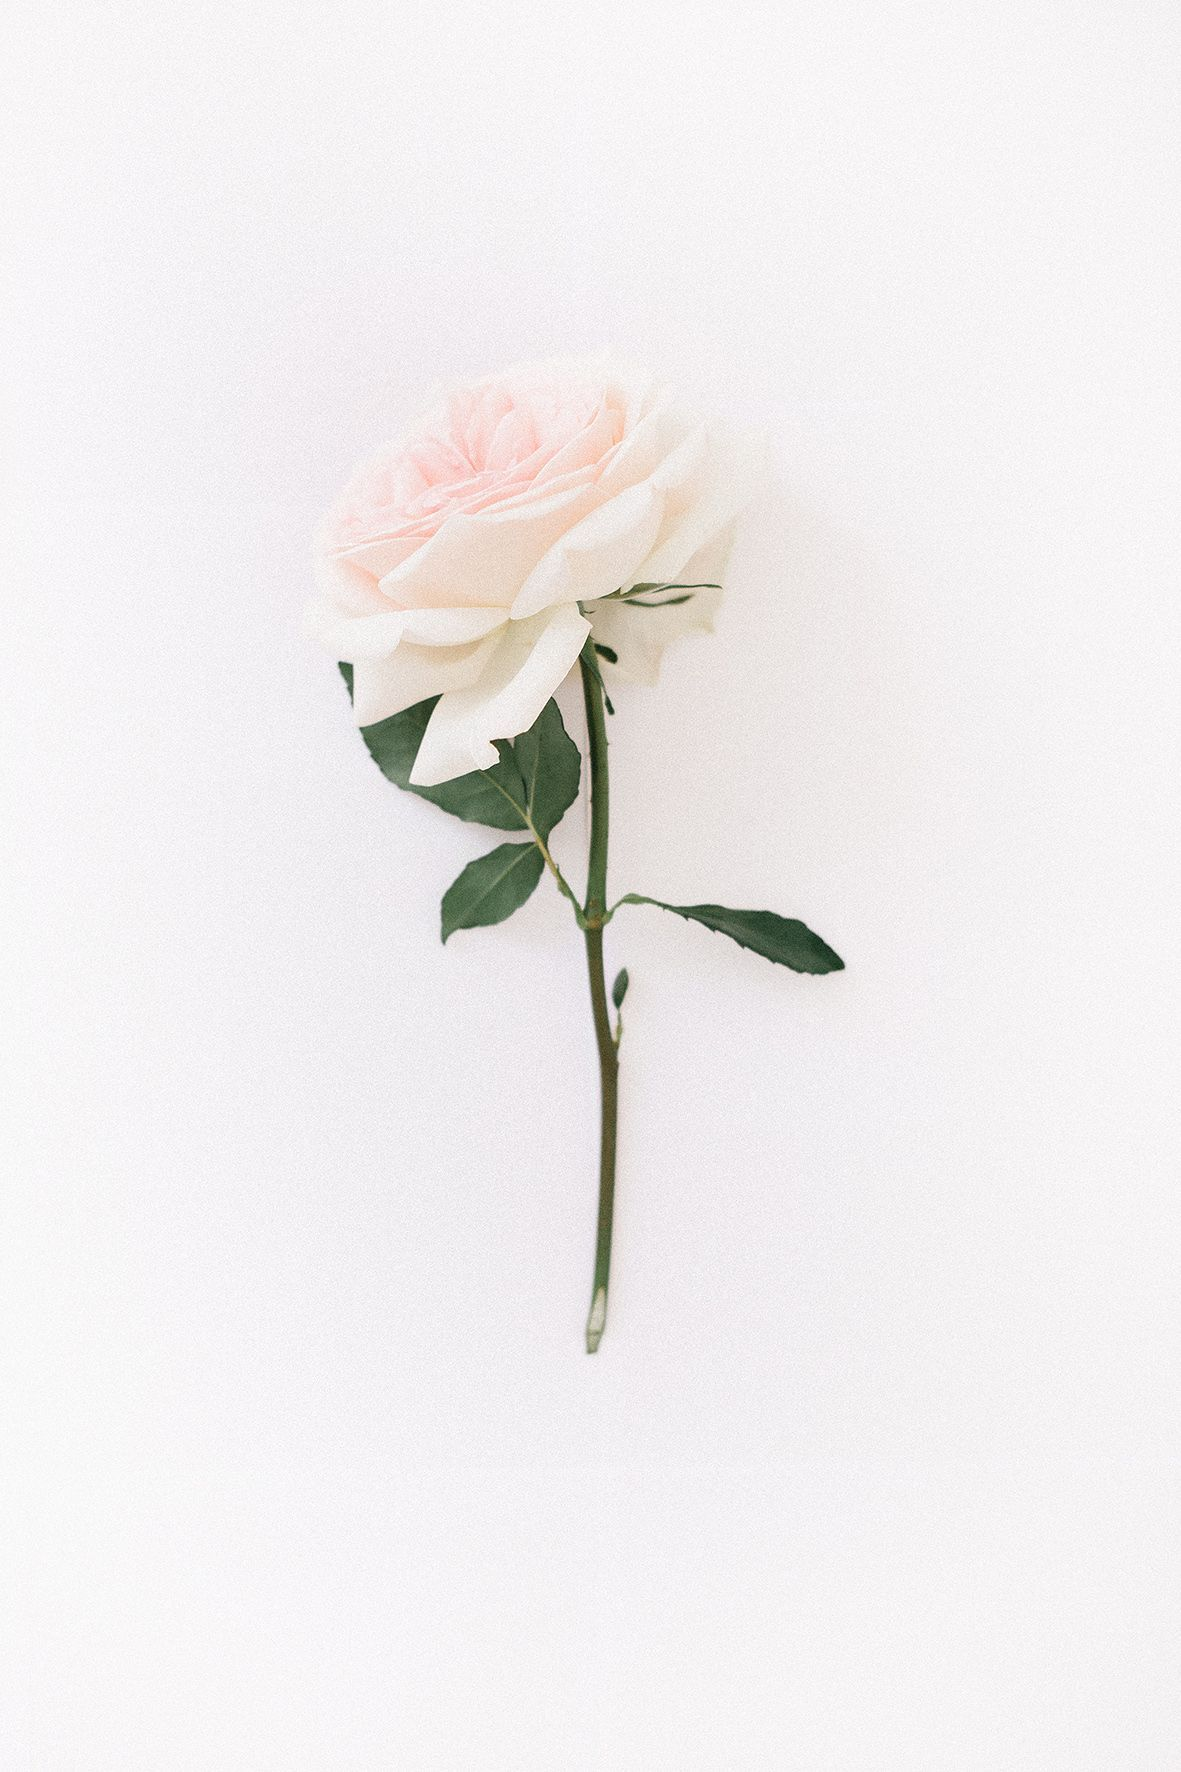 Pin By Jillian On Iphone White Roses Wallpaper Rose Wallpaper